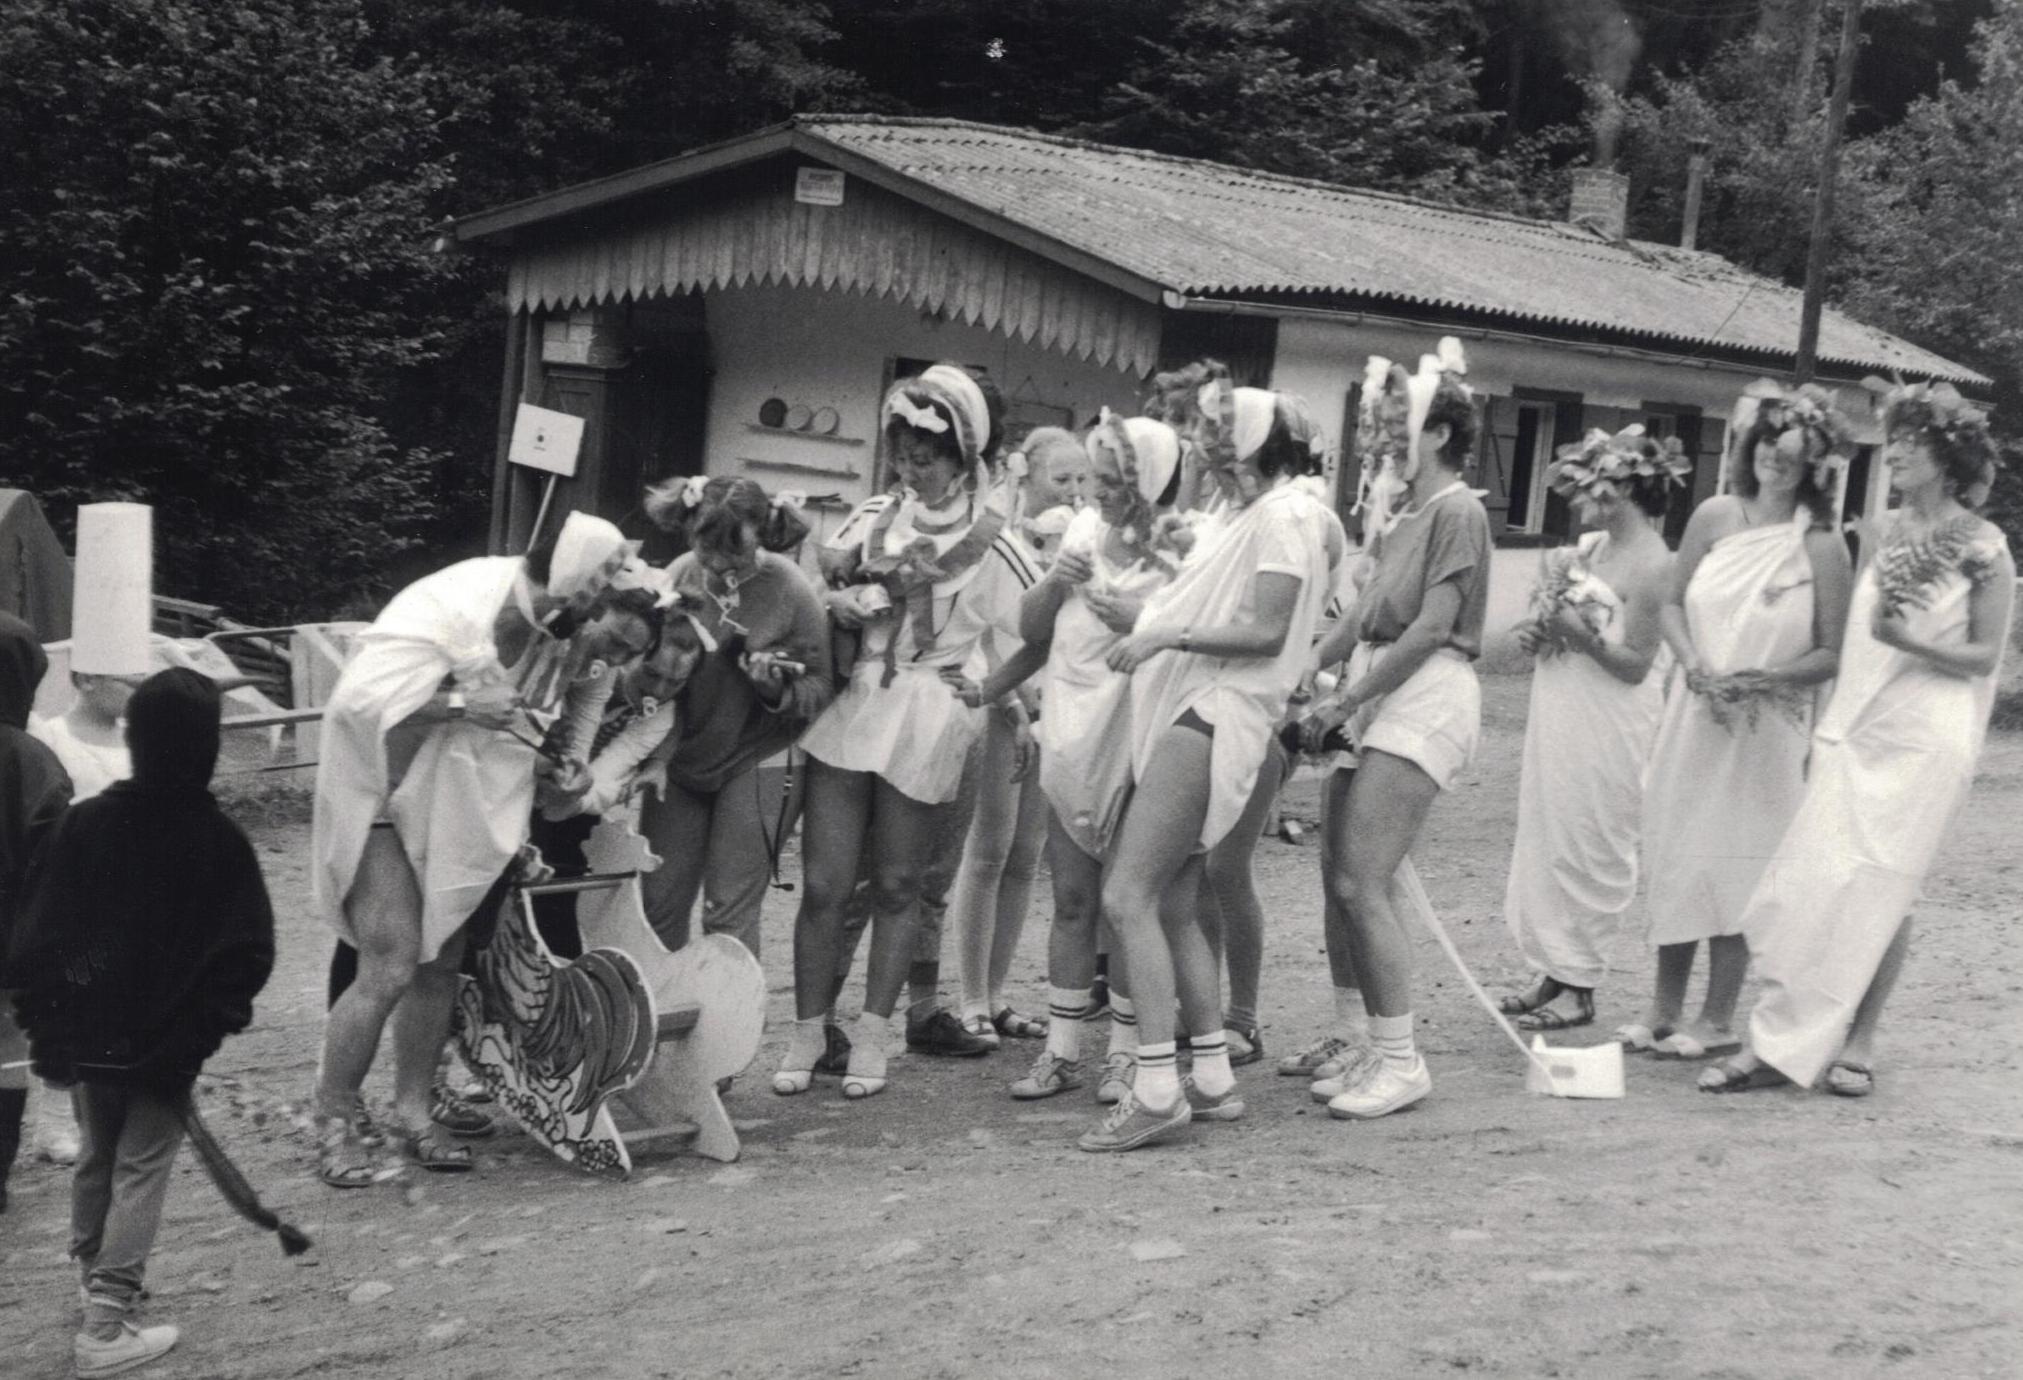 https://www.rudolfaci.cz/wp-content/uploads/2020/11/1987_Karneval_03.jpg